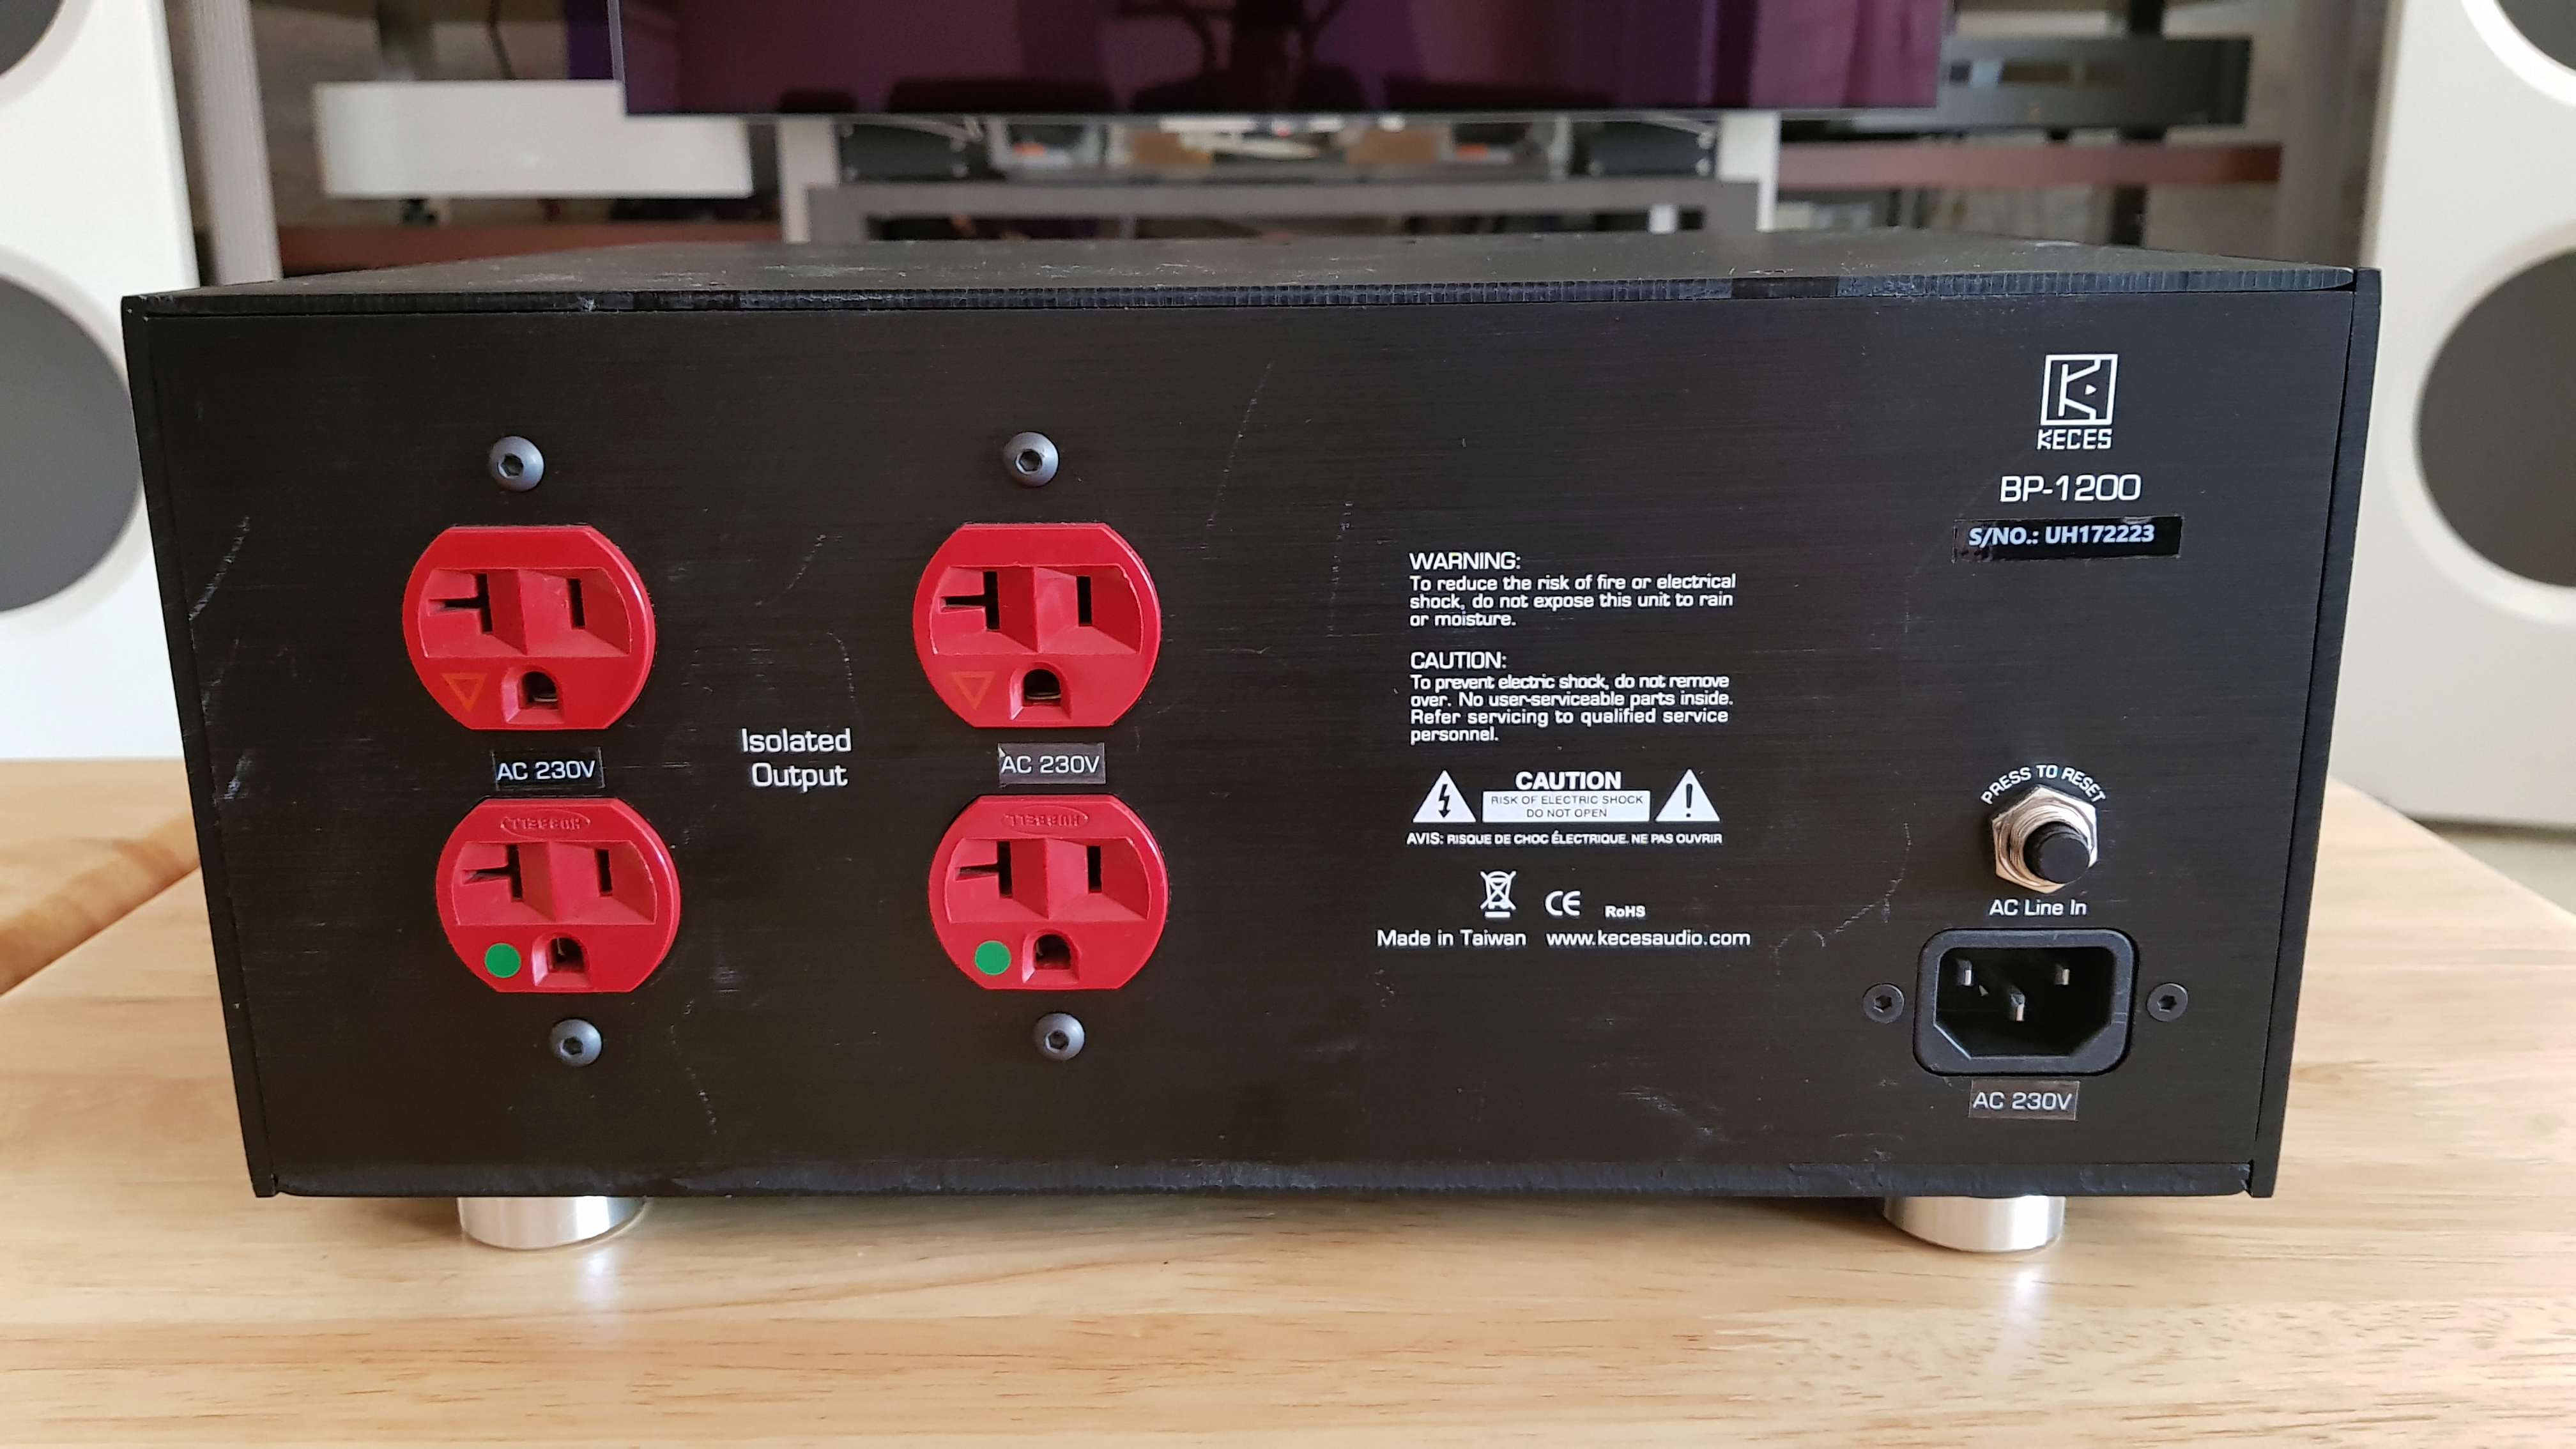 Keces BP-1200 Power Isolator(Sold) 20180612